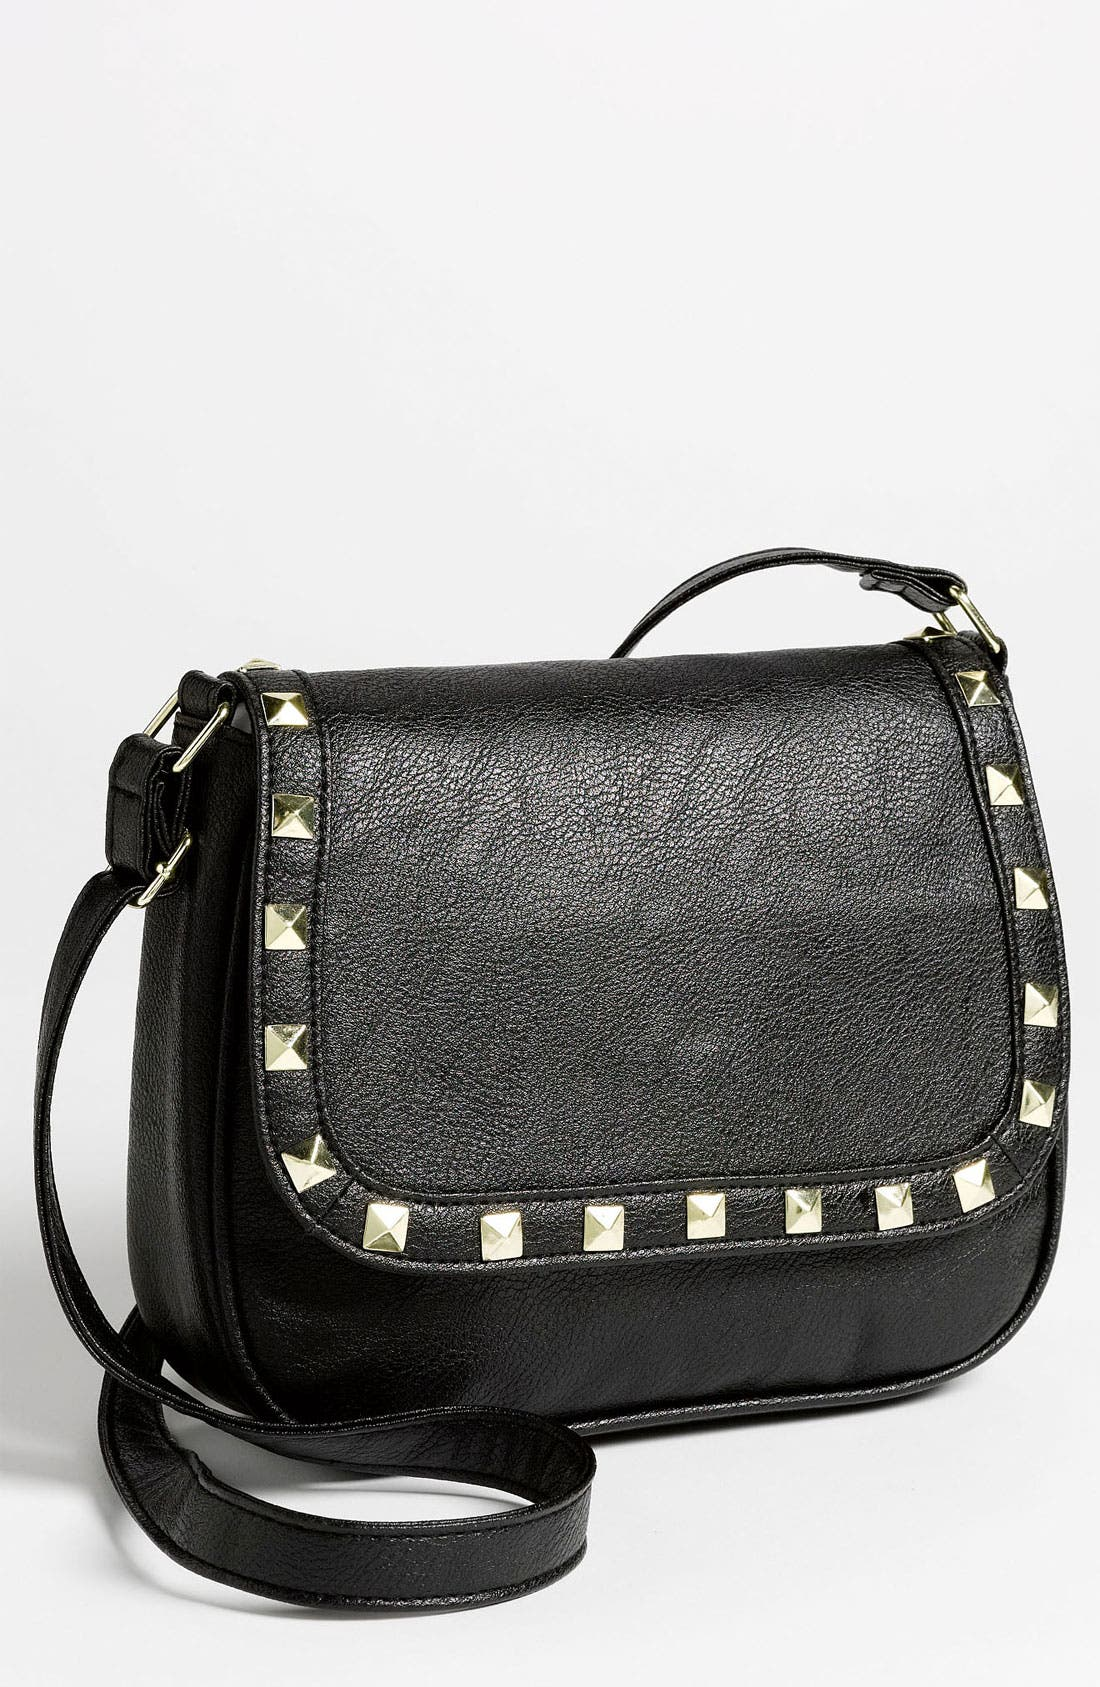 Main Image - OMG Studded Crossbody Bag